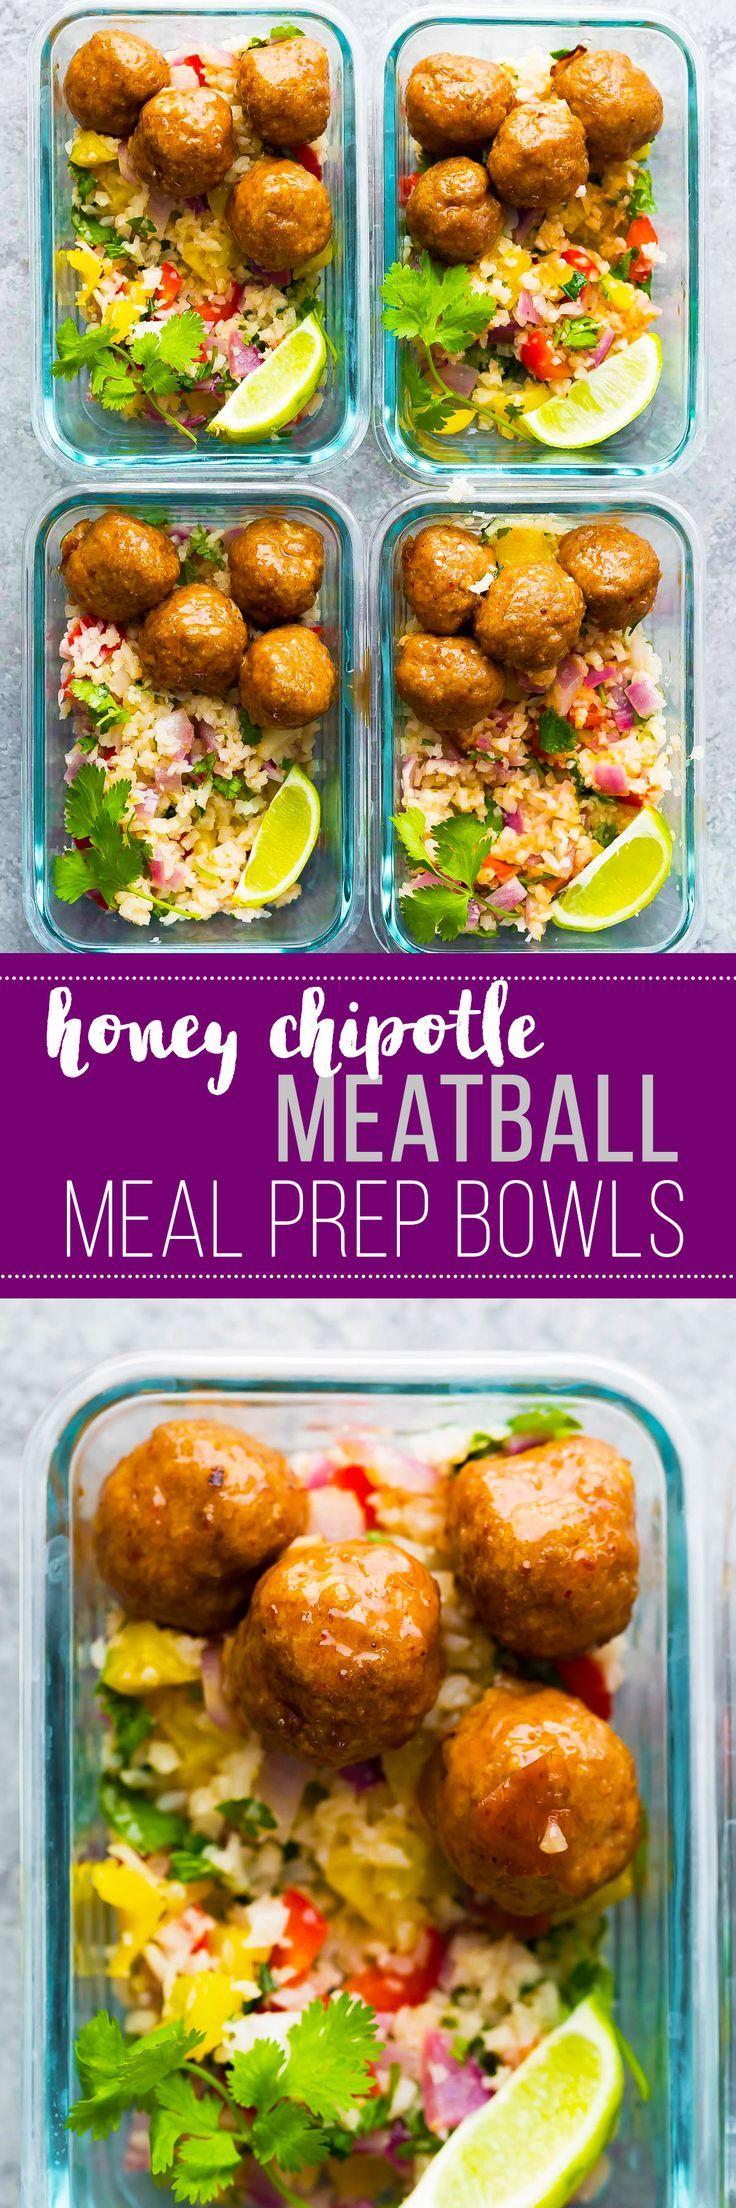 Honey Chipotle Meatball Meal Prep Bowls Recipe Meal Prep Bowls